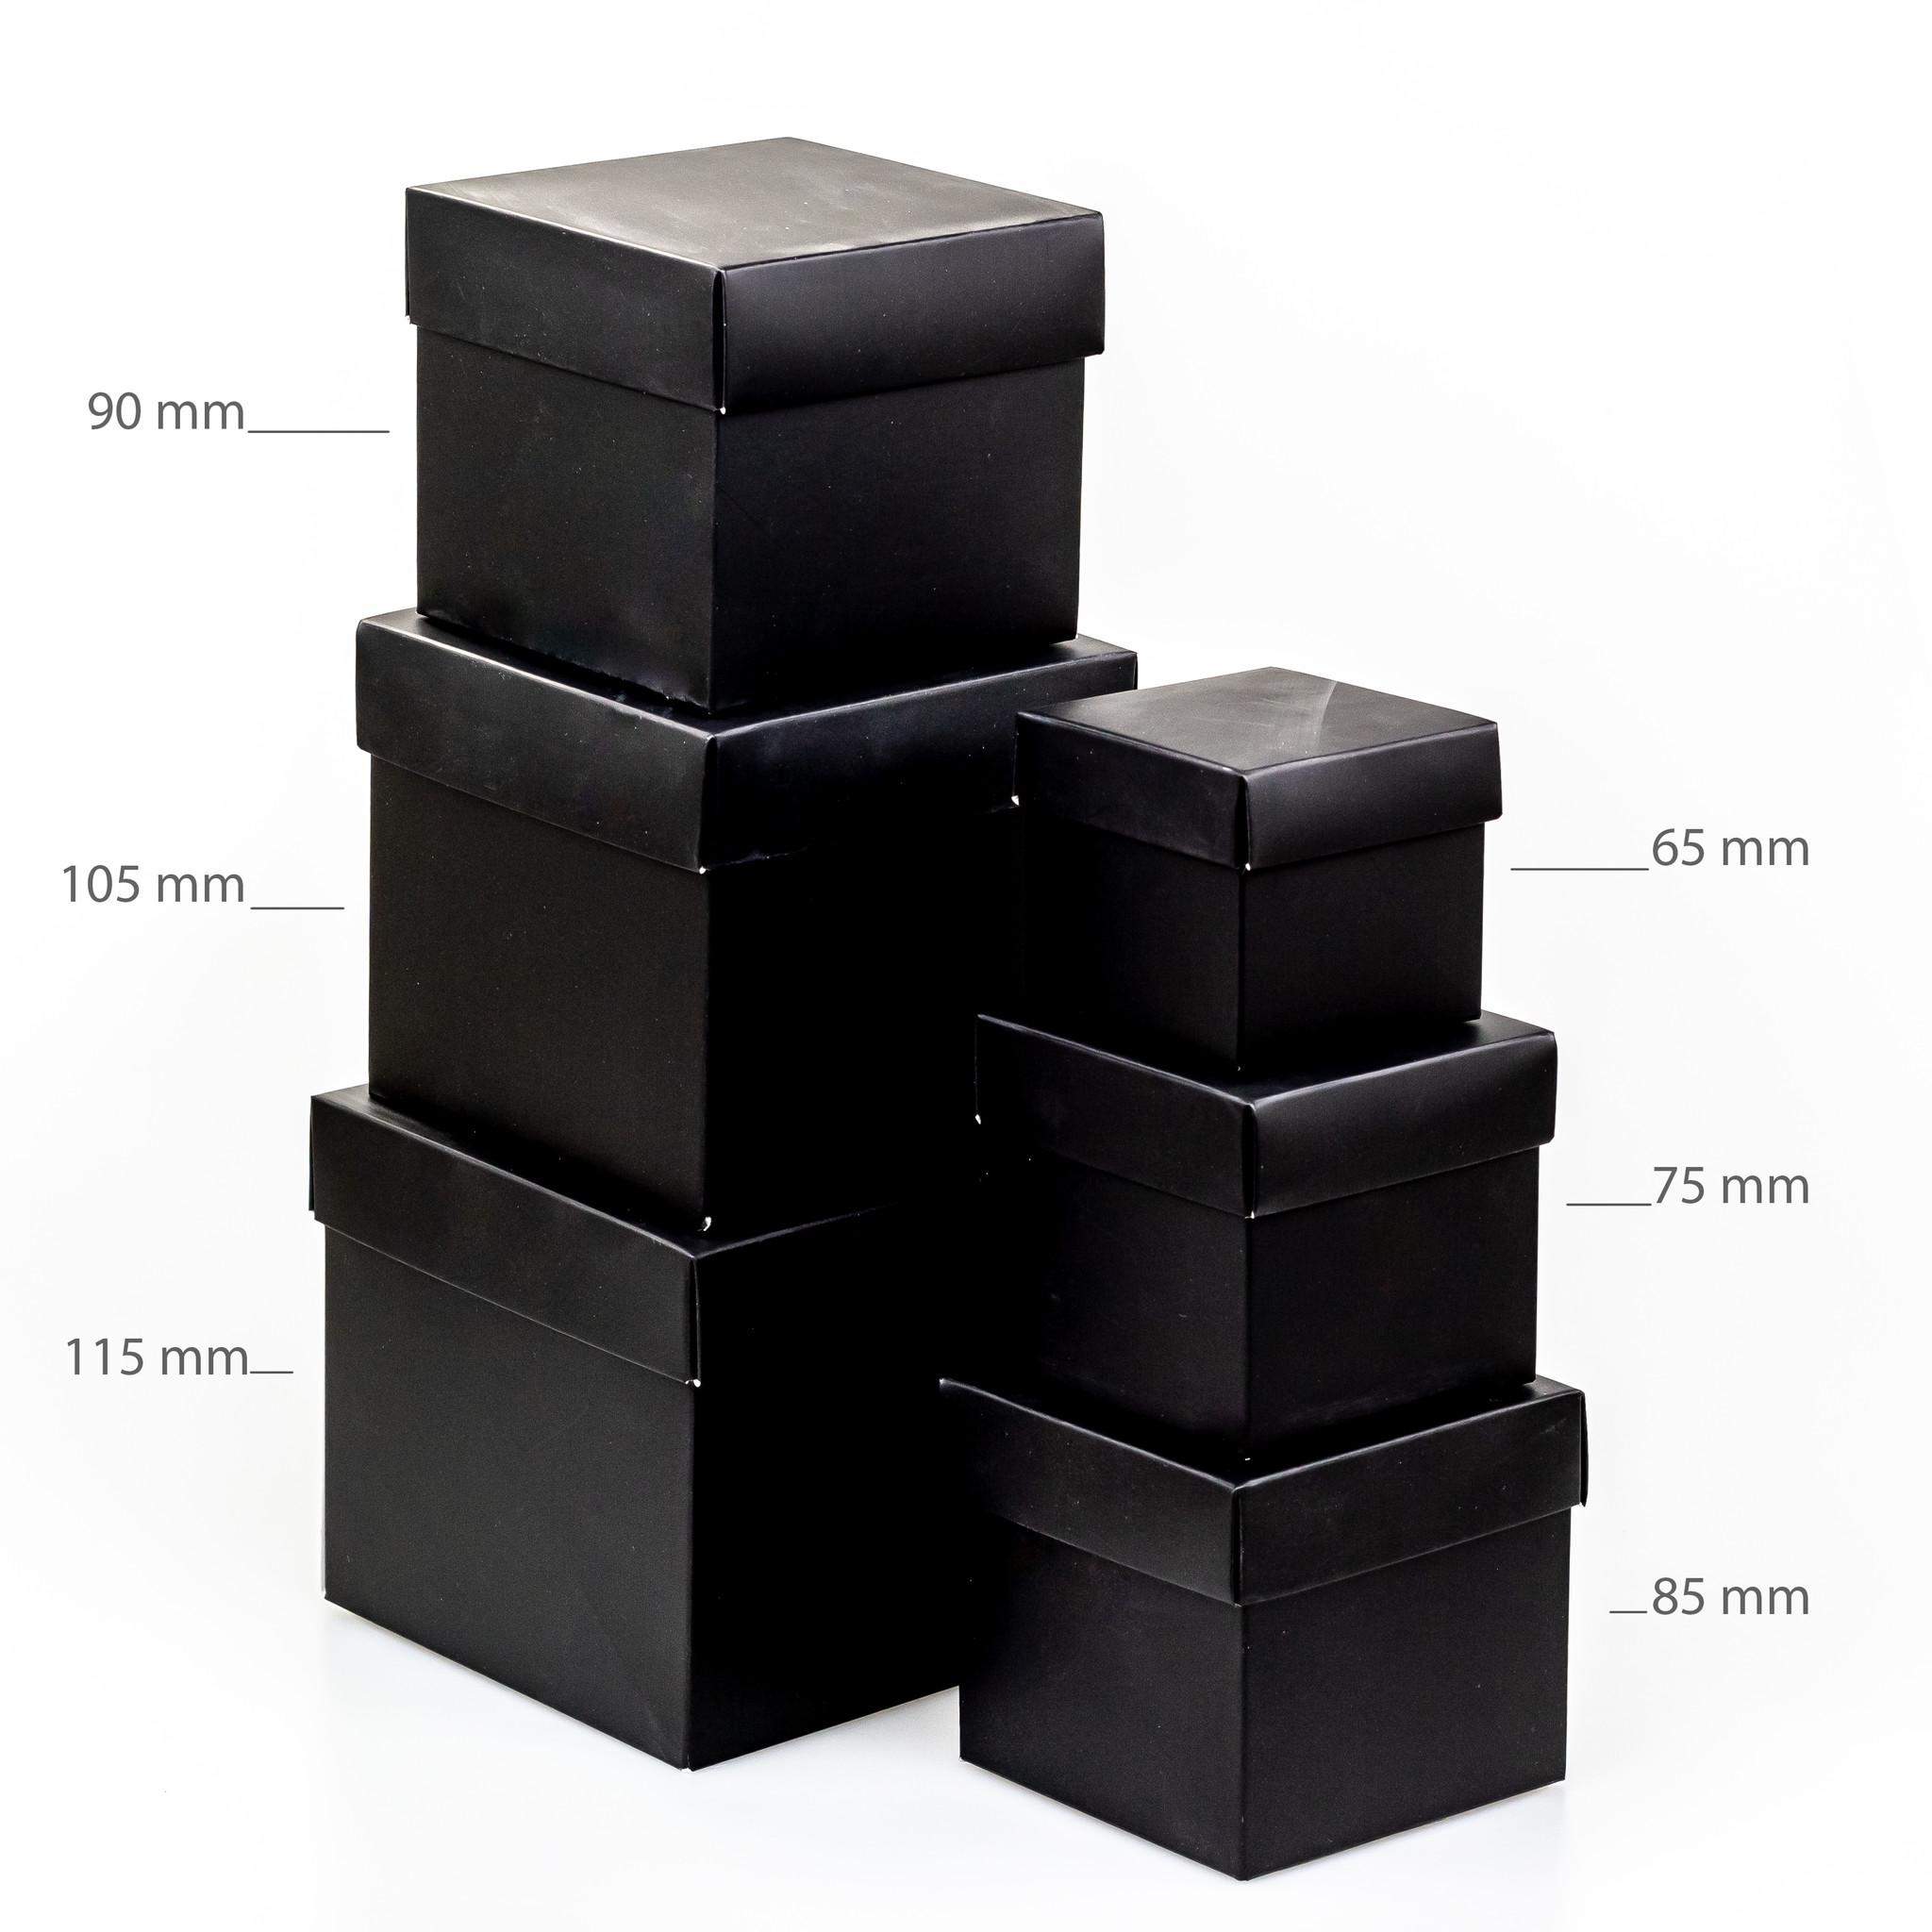 Cubebox - Glänzend Roségold